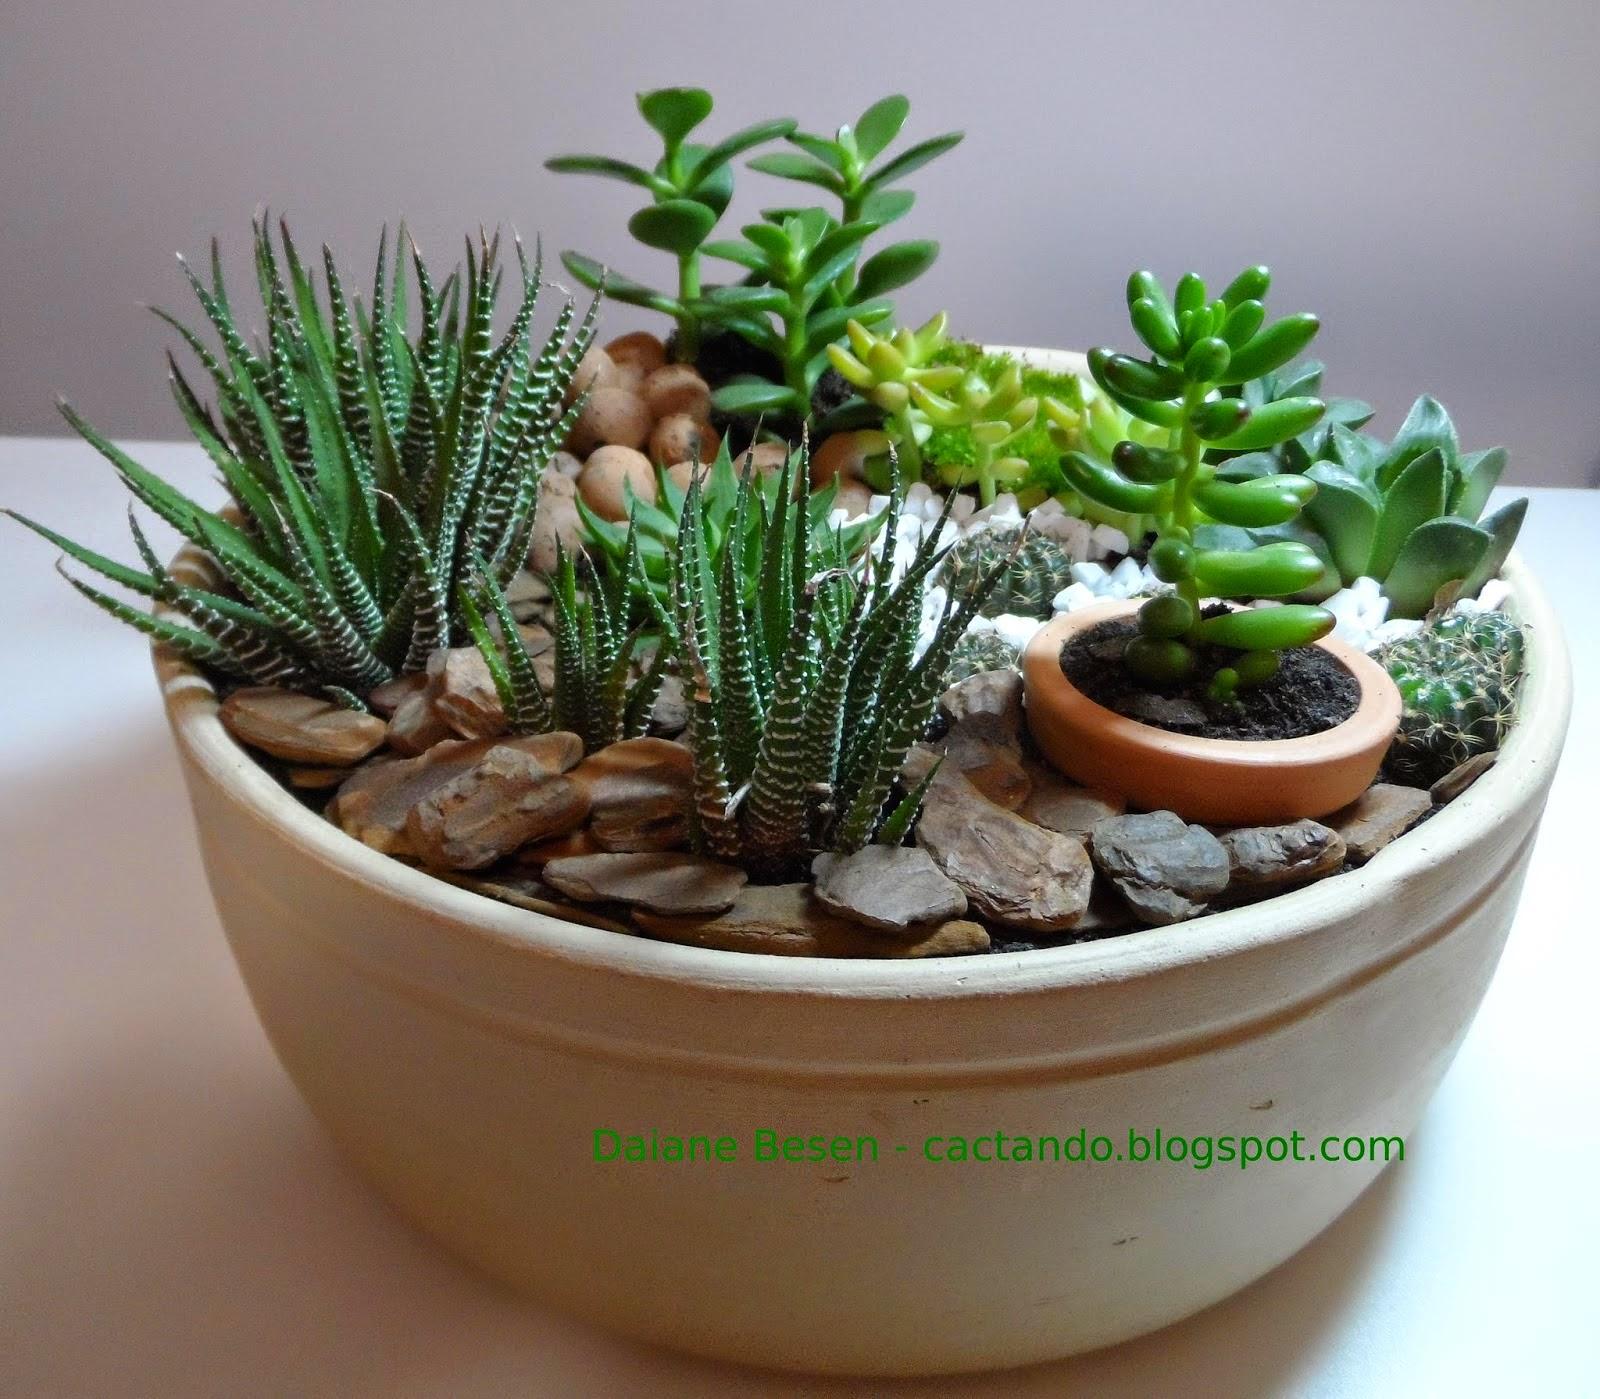 mini jardim de suculentas passo a passo : mini jardim de suculentas passo a passo:cuidados com as suculentas as plantas suculentas necessitam de